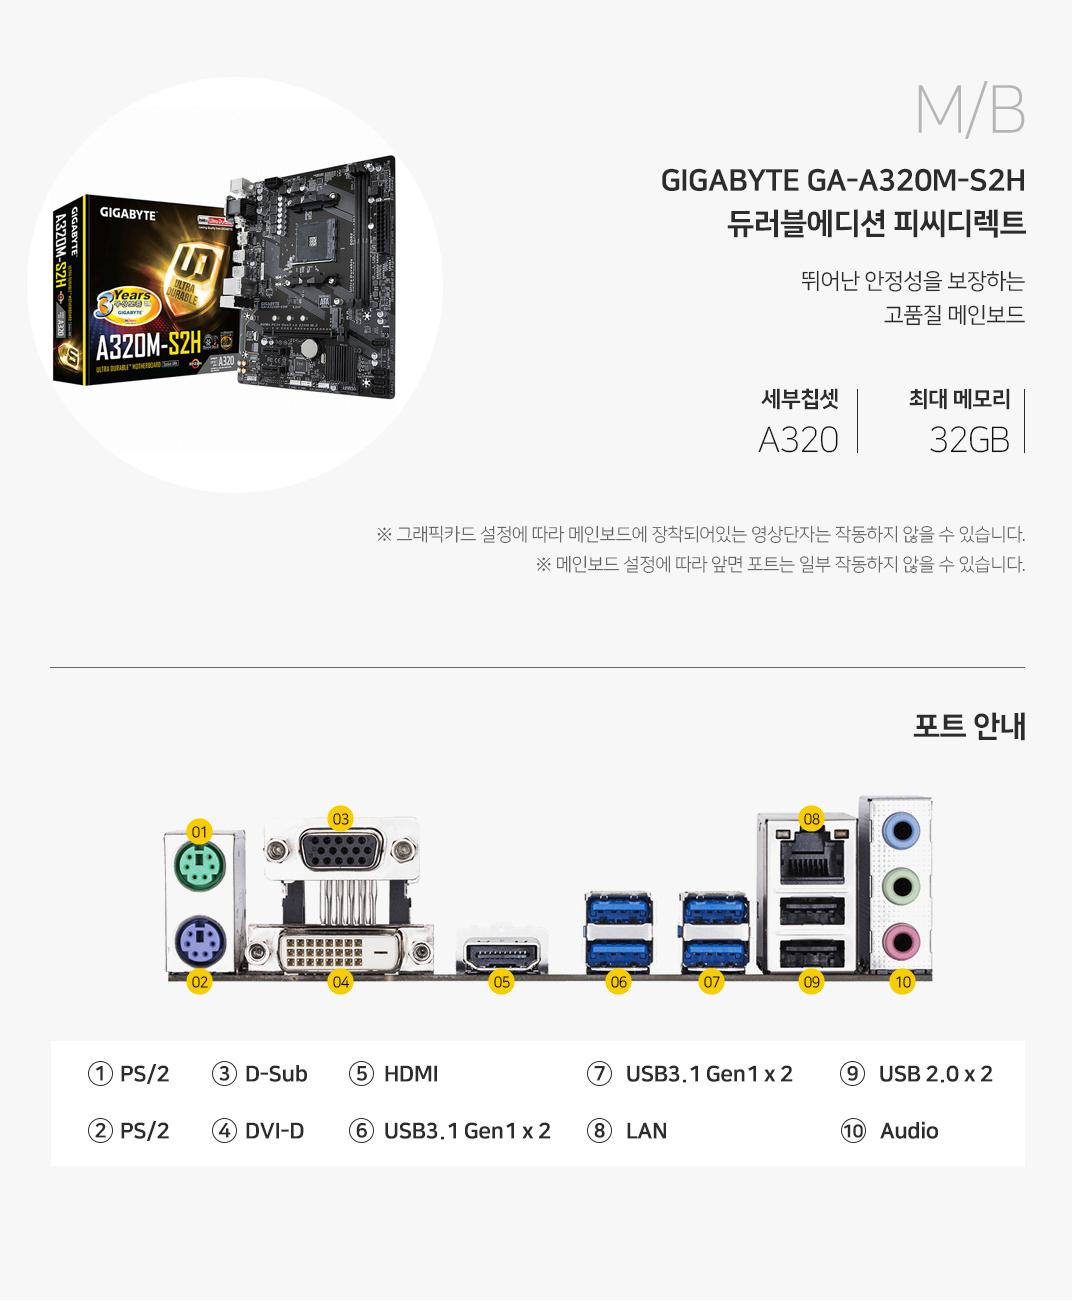 CPU GIGABYTE GA-A320M-S2H 듀러블에디션 피씨디렉트 뛰어난 안정성을 보장하는 고품질 메인보드 세부칩셋A320 최대 메모리32GB 그래픽 설정에 따라 메인보드에 장착되어 있는 영상단자는 작동하지 않을 수 있습니다. 메인보드 설정에 따라 앞면 포트는 일부 작동하지 않을 수 있습니다.